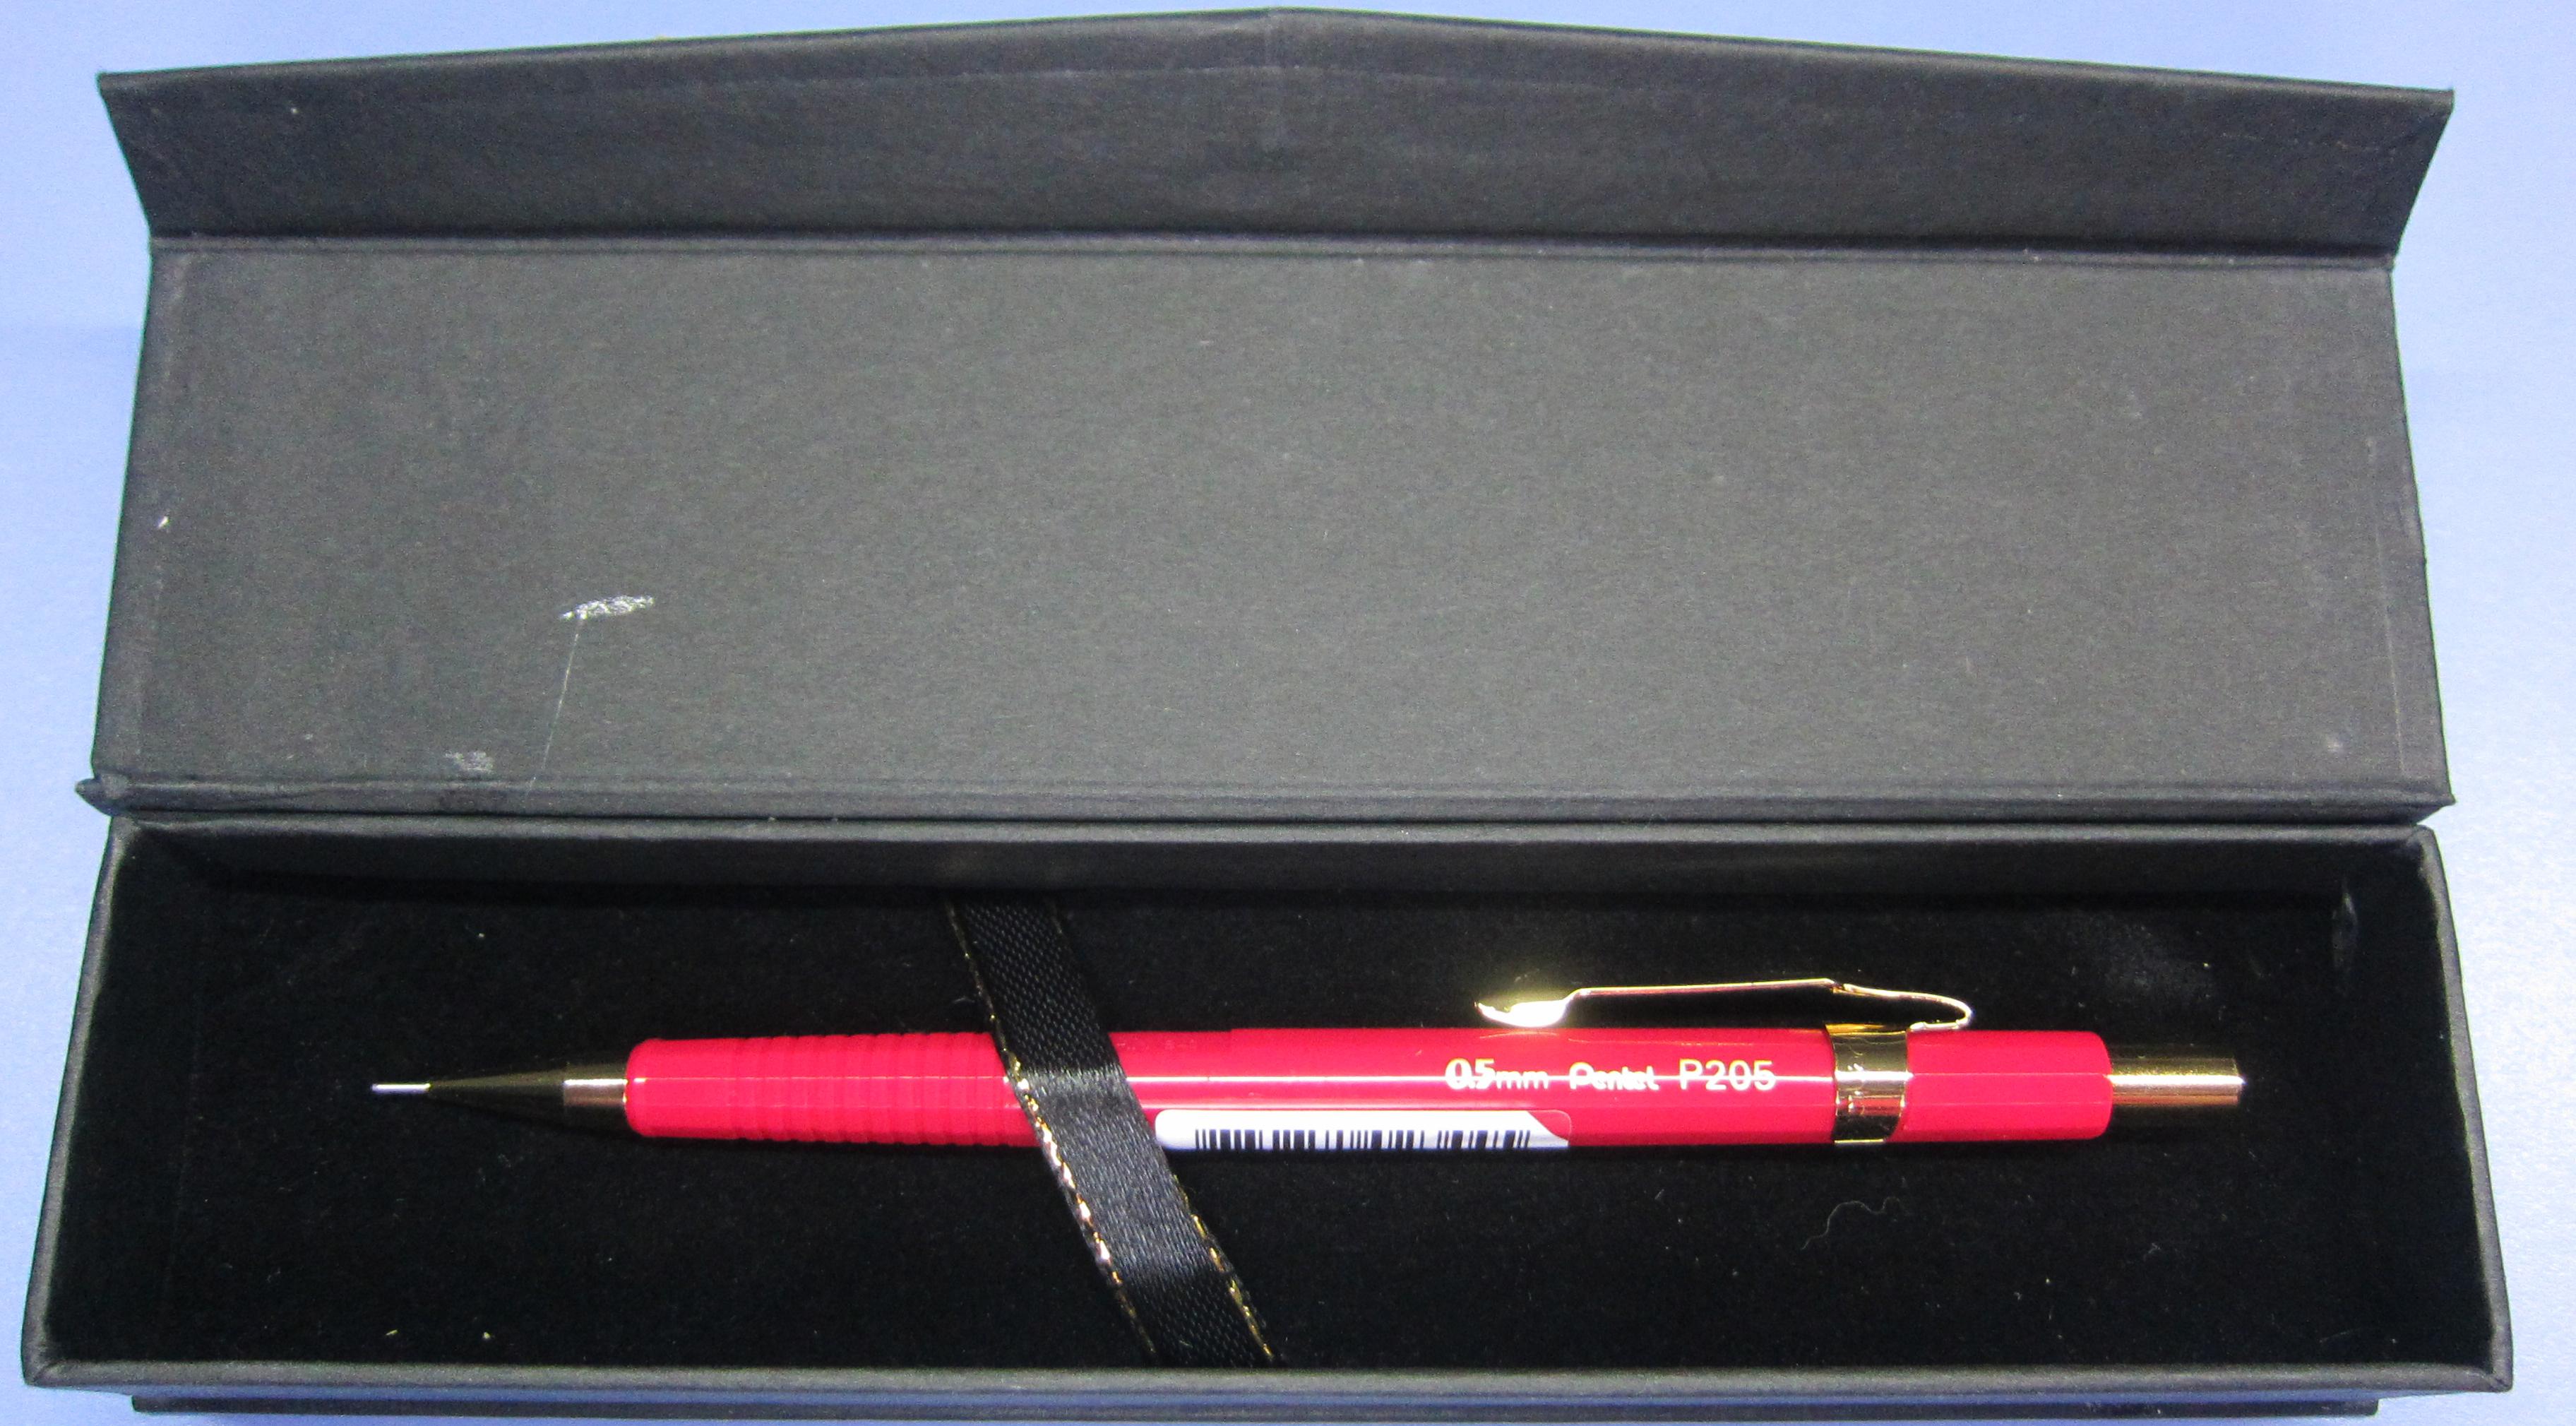 D - Gift Box - Pentel P205 Gilded Pencil Box (XBL5) - 2019